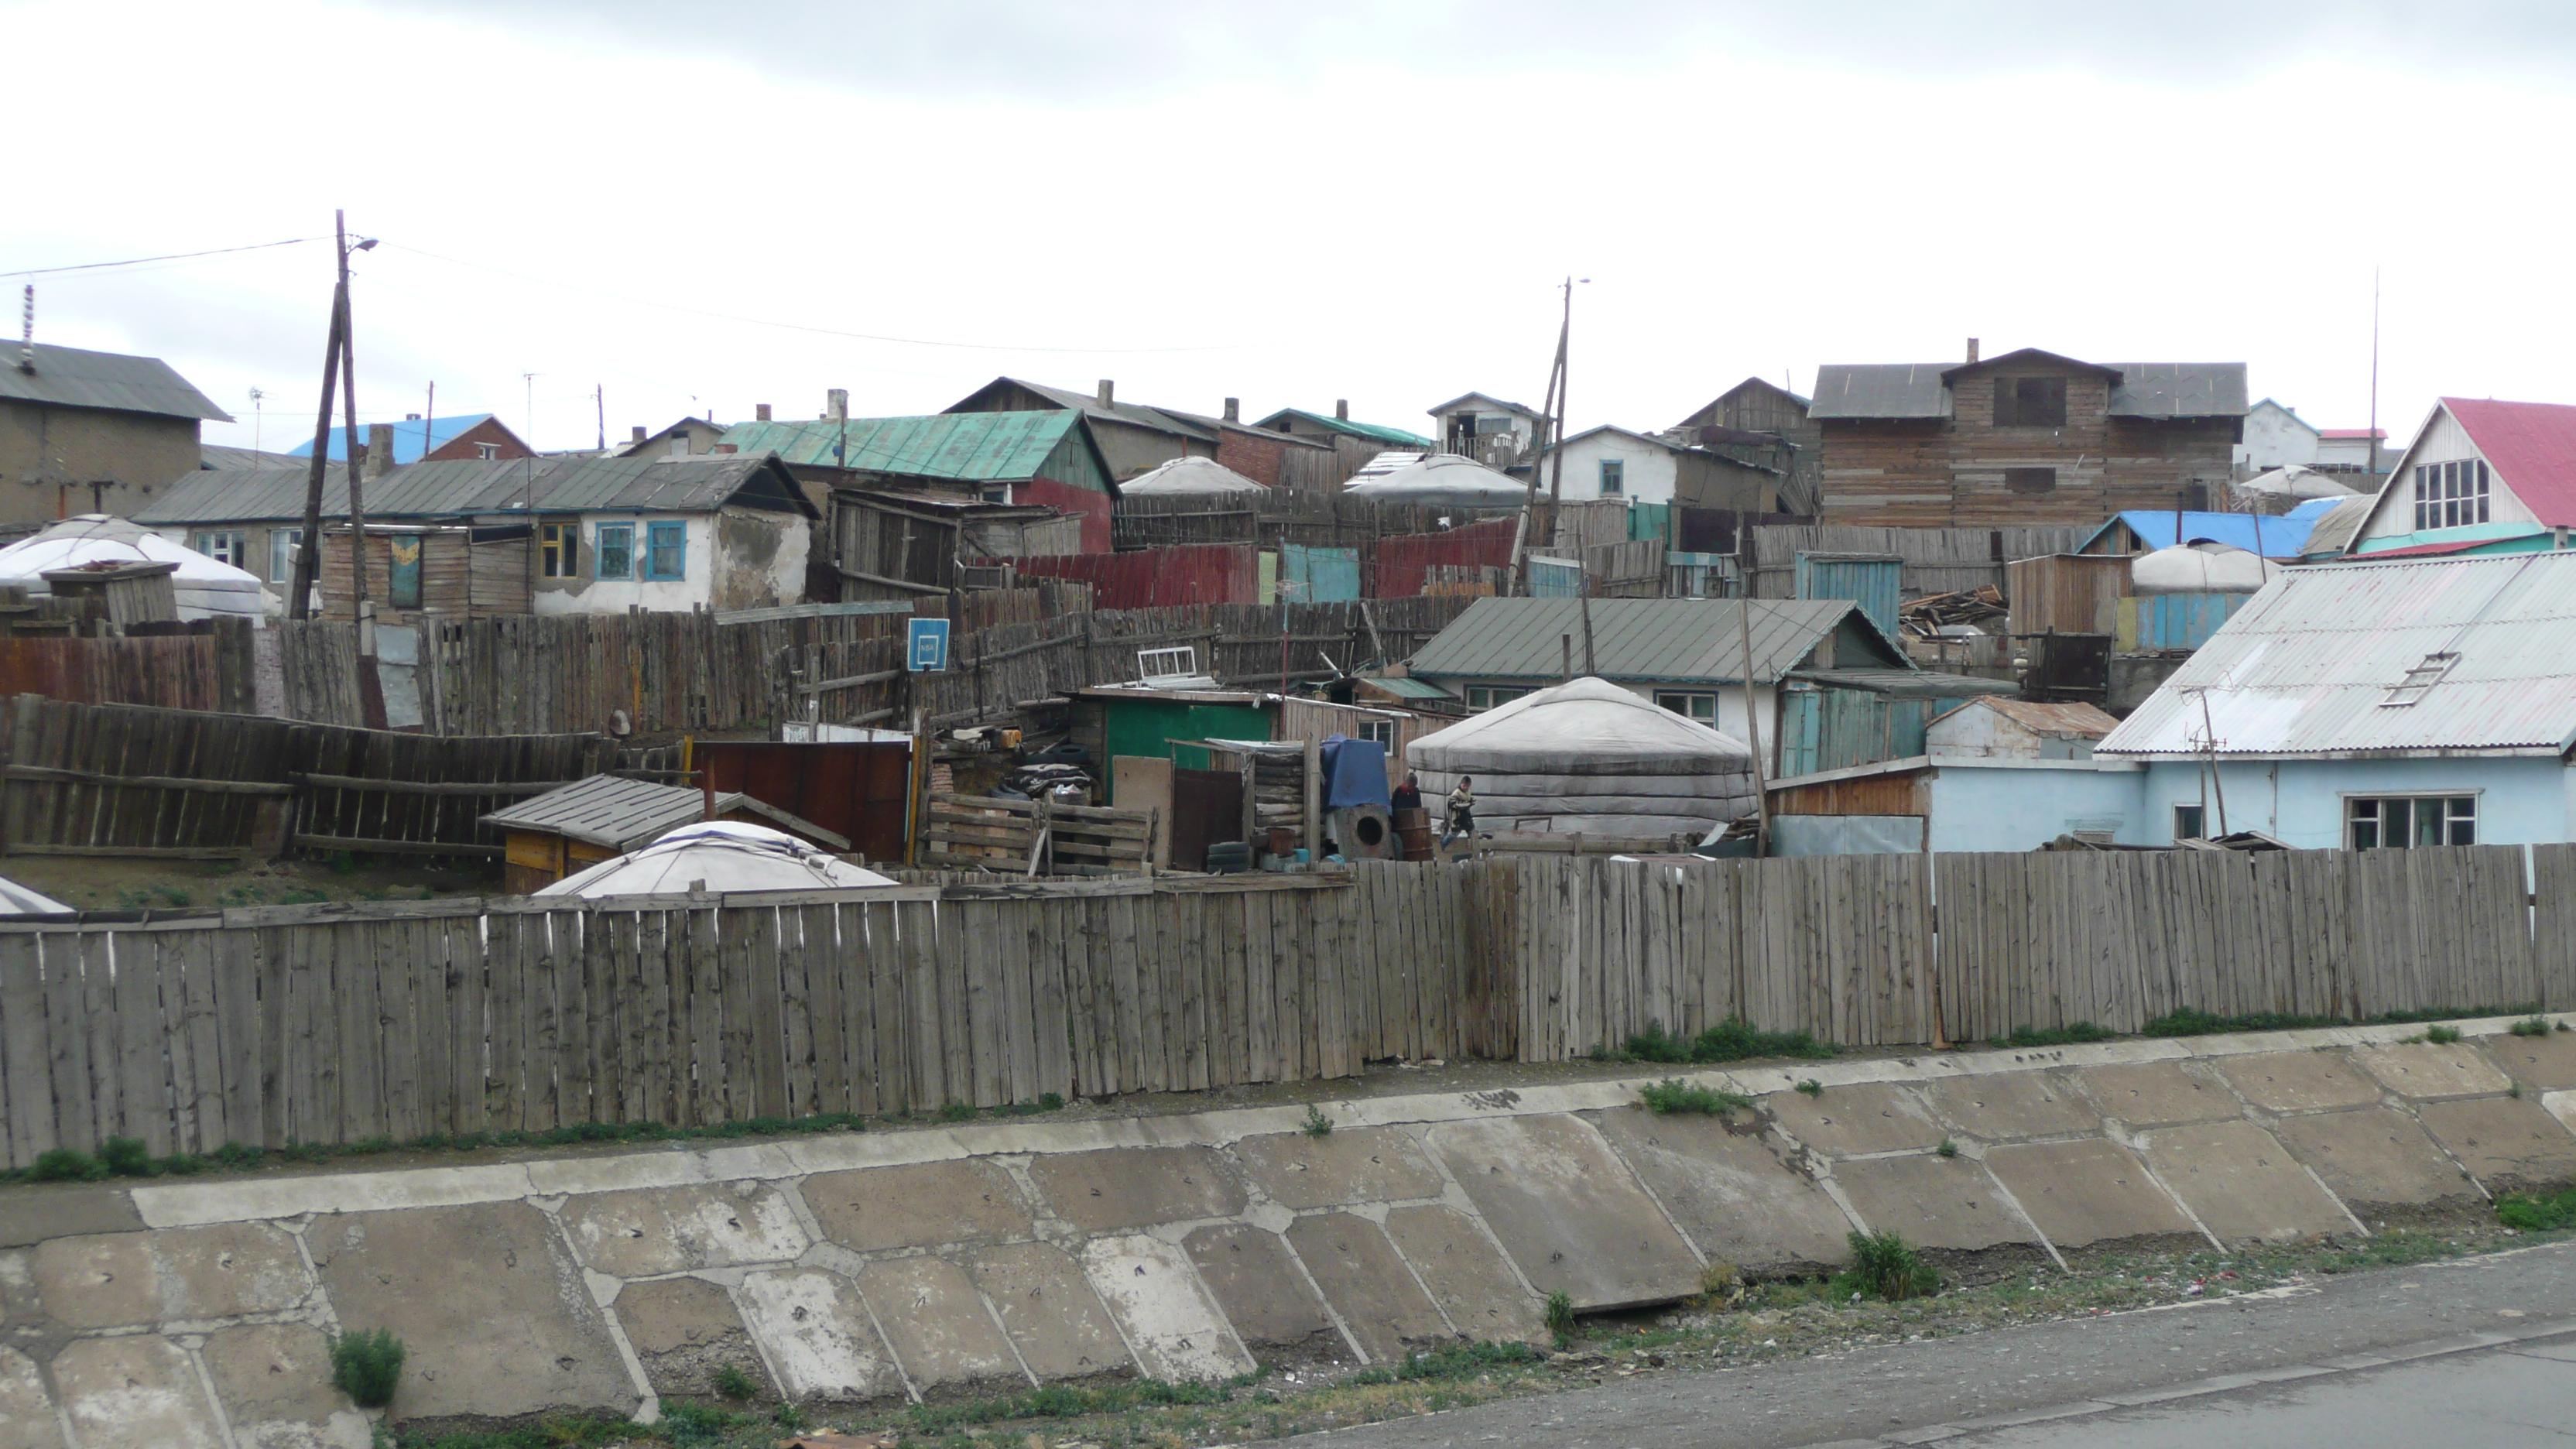 Yurts in Ulan Bator 01.JPG